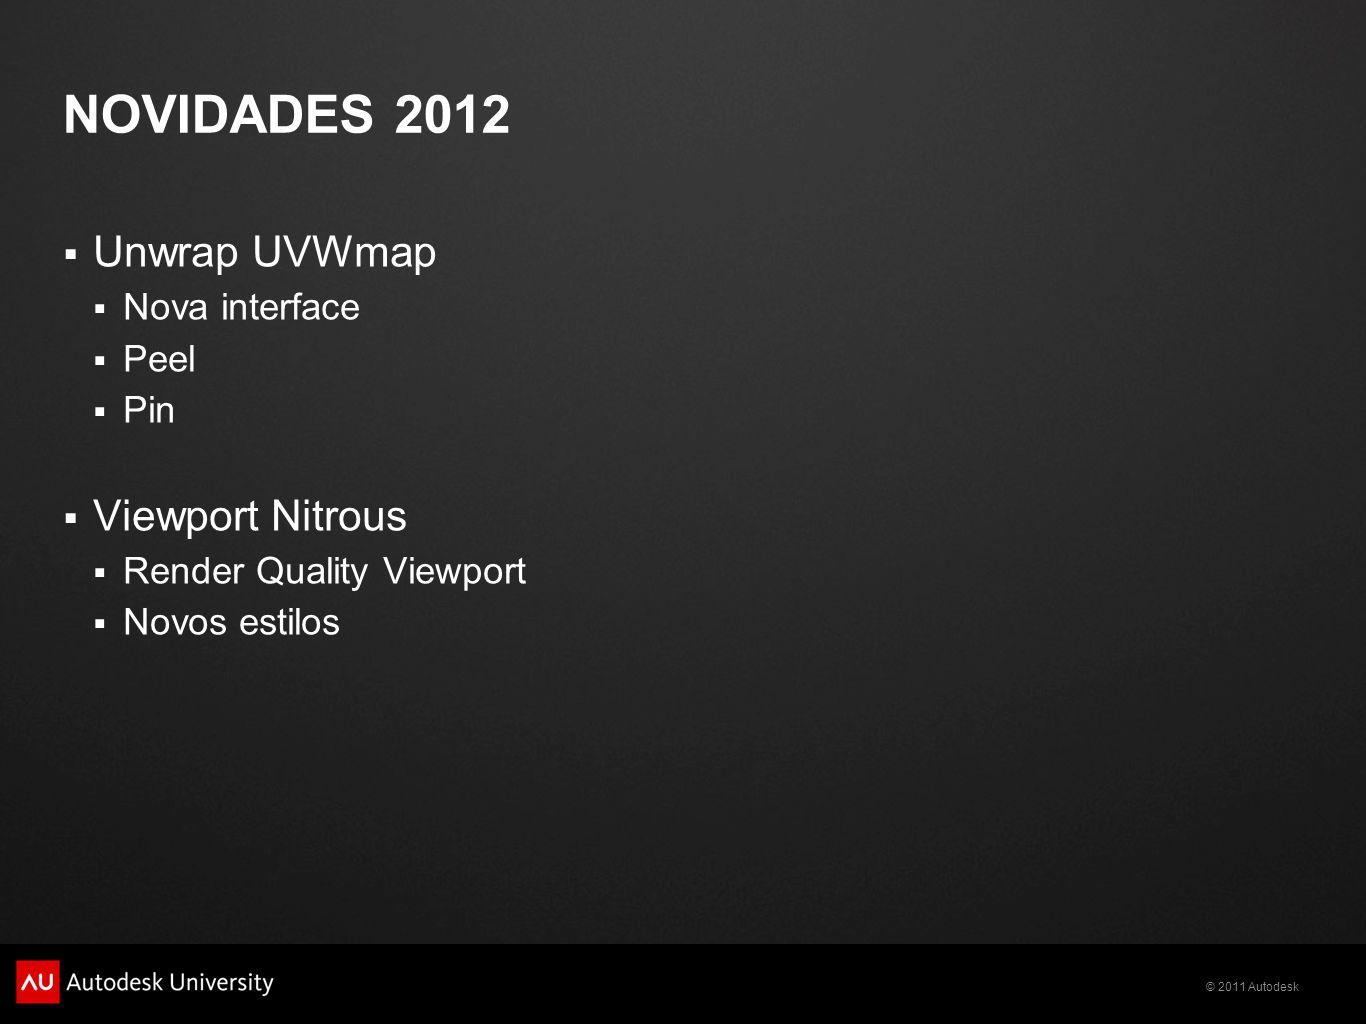 © 2011 Autodesk NOVIDADES 2012 Unwrap UVWmap Nova interface Peel Pin Viewport Nitrous Render Quality Viewport Novos estilos